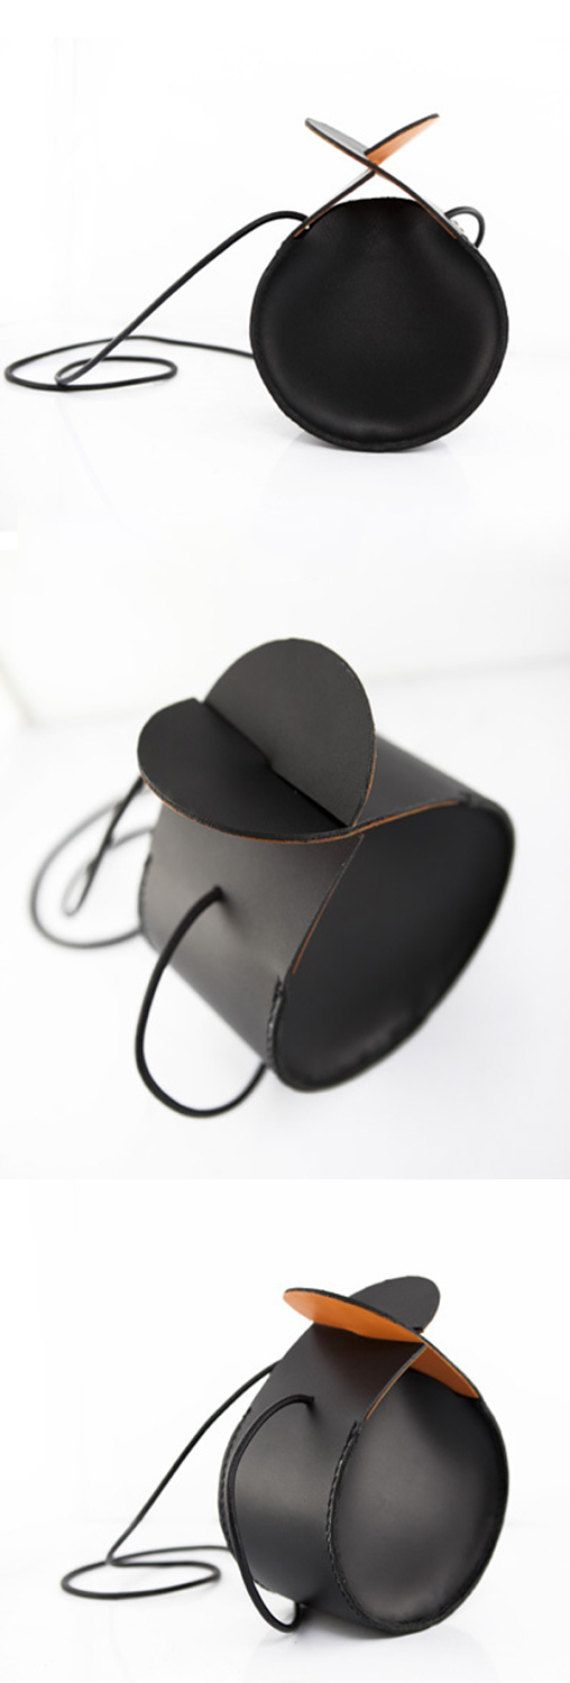 Portemonnee Koeienprint.Kleine Zwarte Portemonnee Kleine Lederen Tas Mini Crossbody Tas